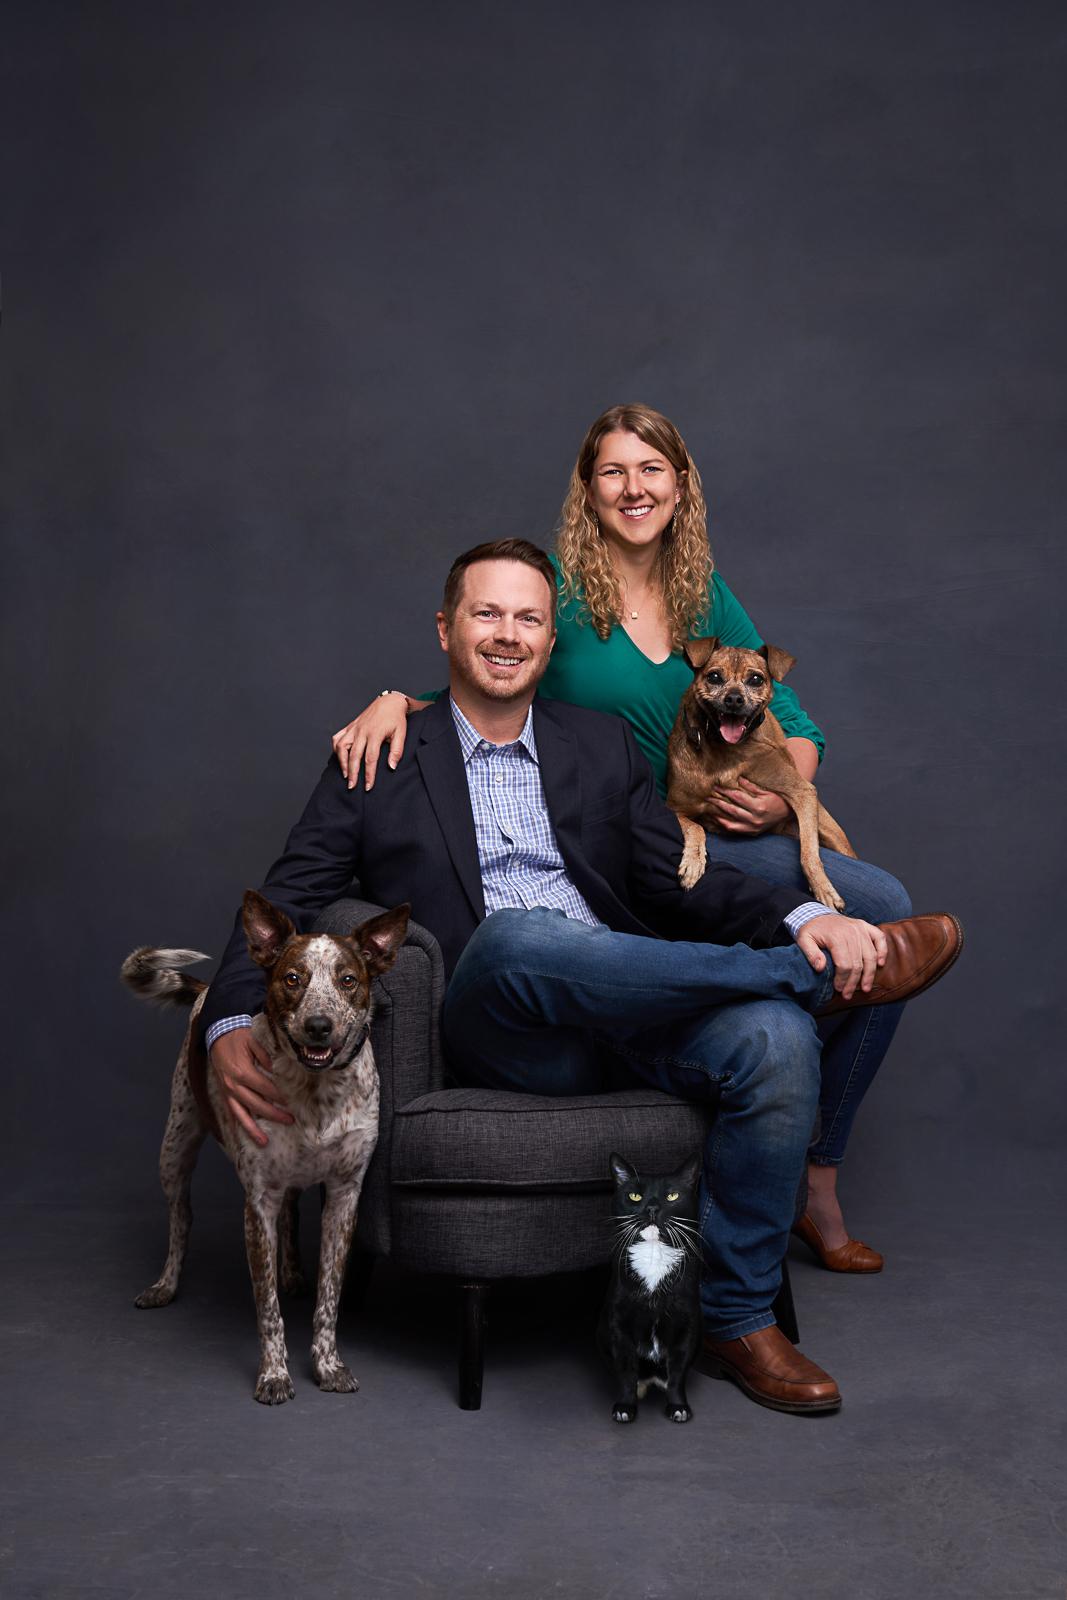 Loveland Family Photos